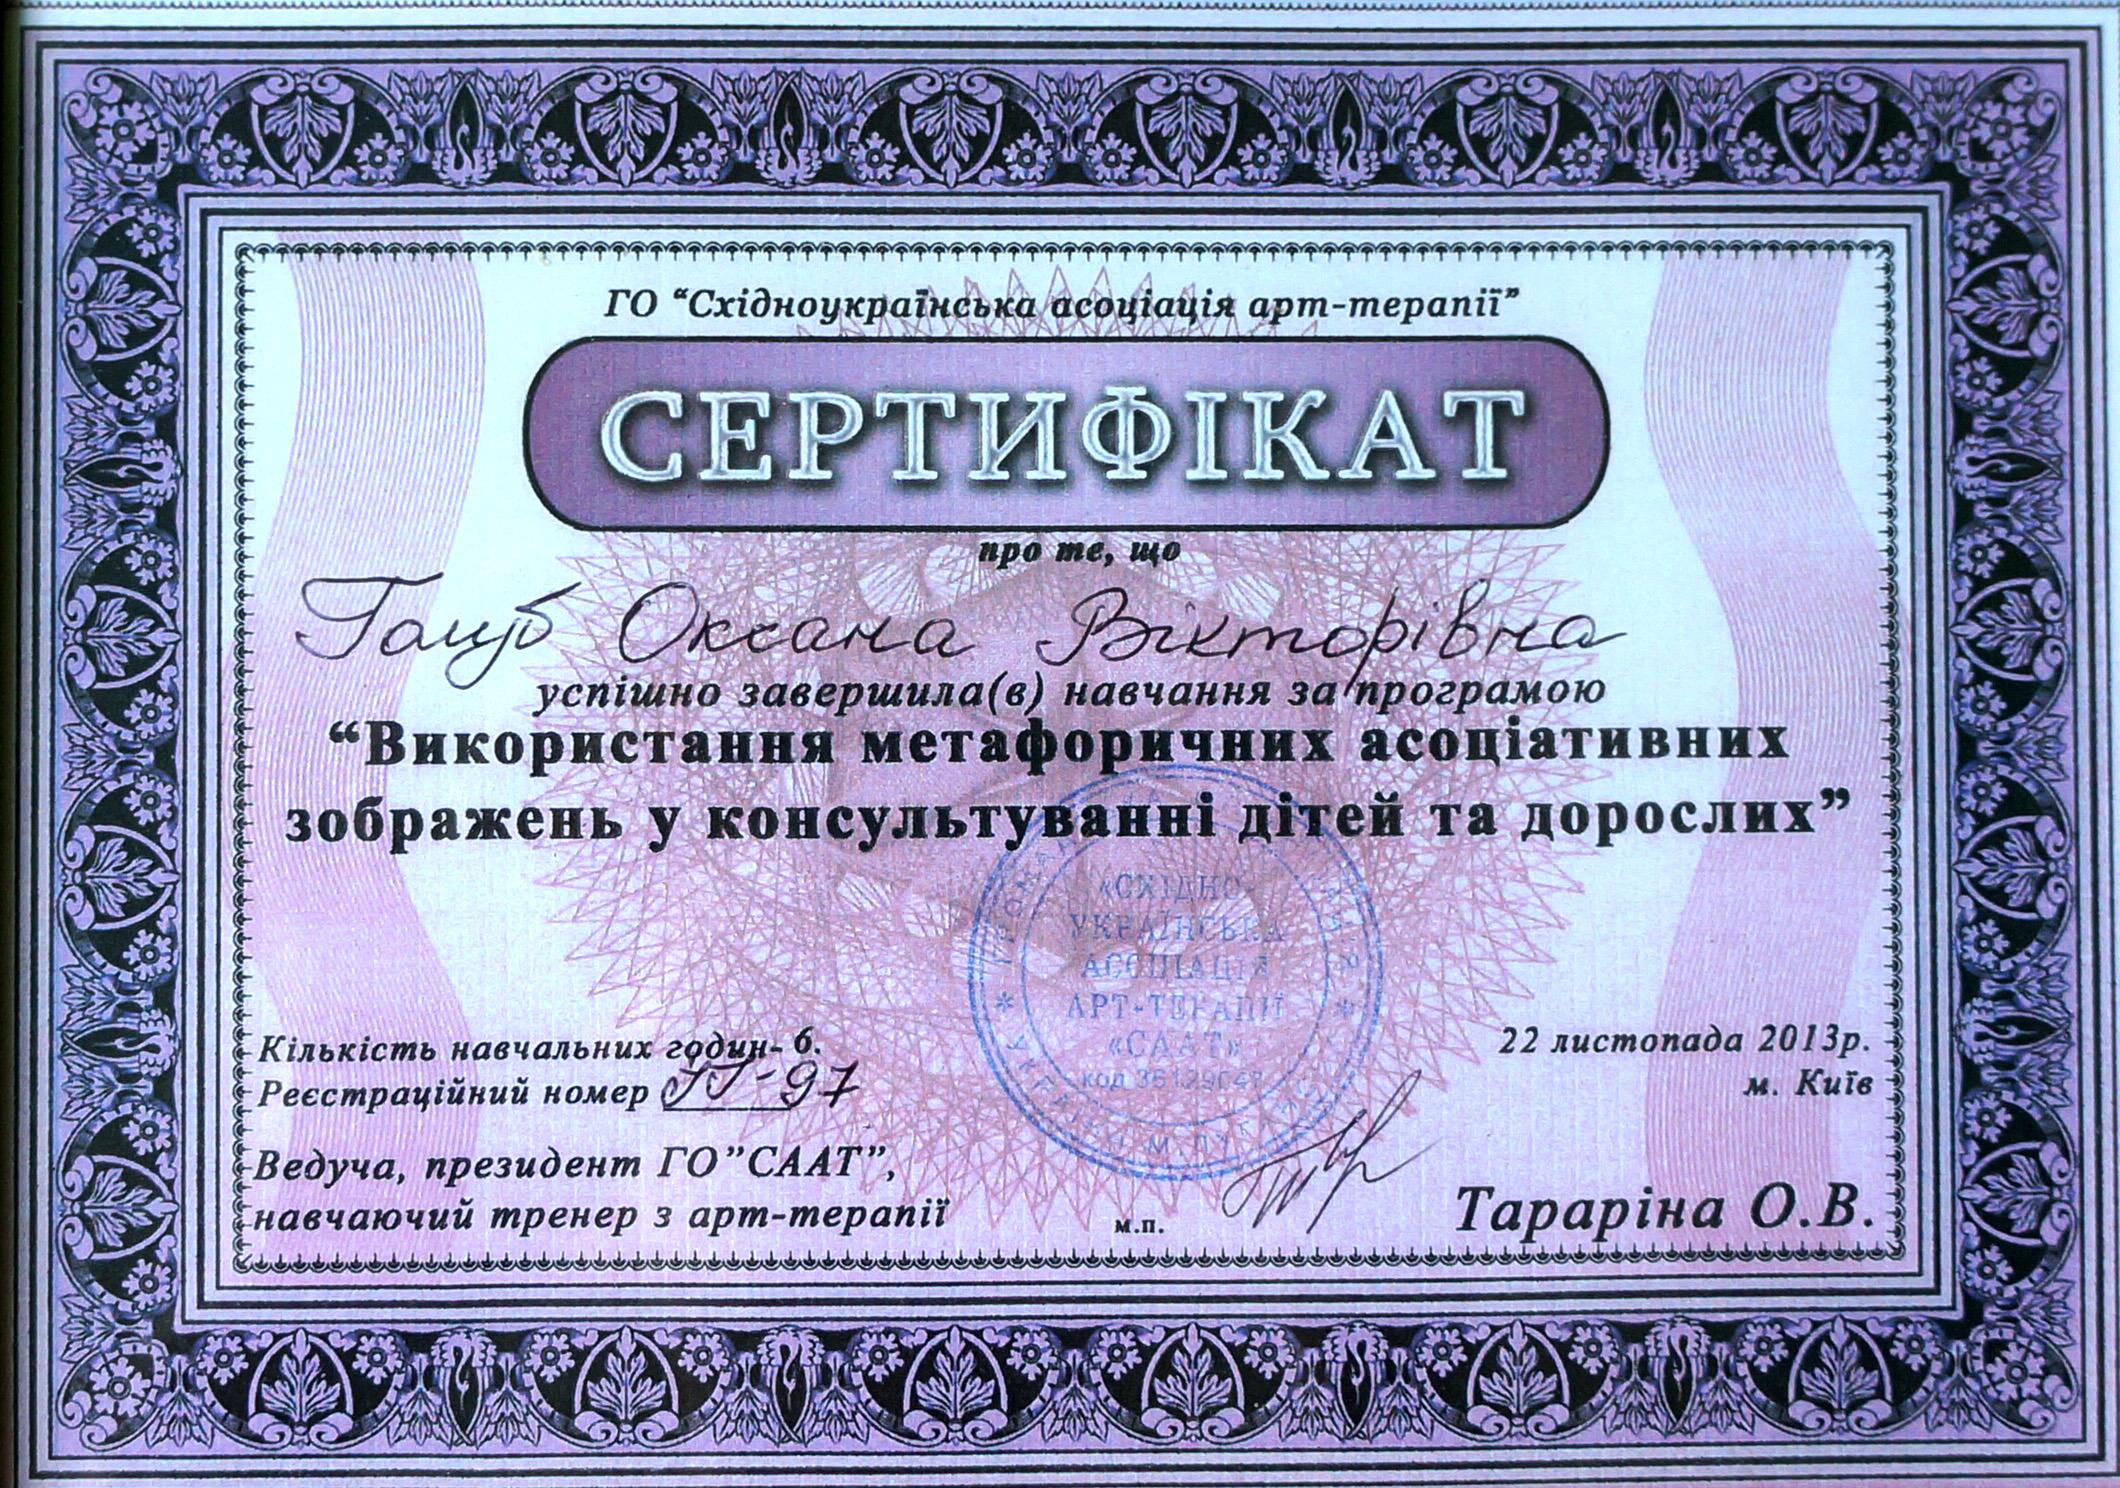 Semejnyj_psiholog